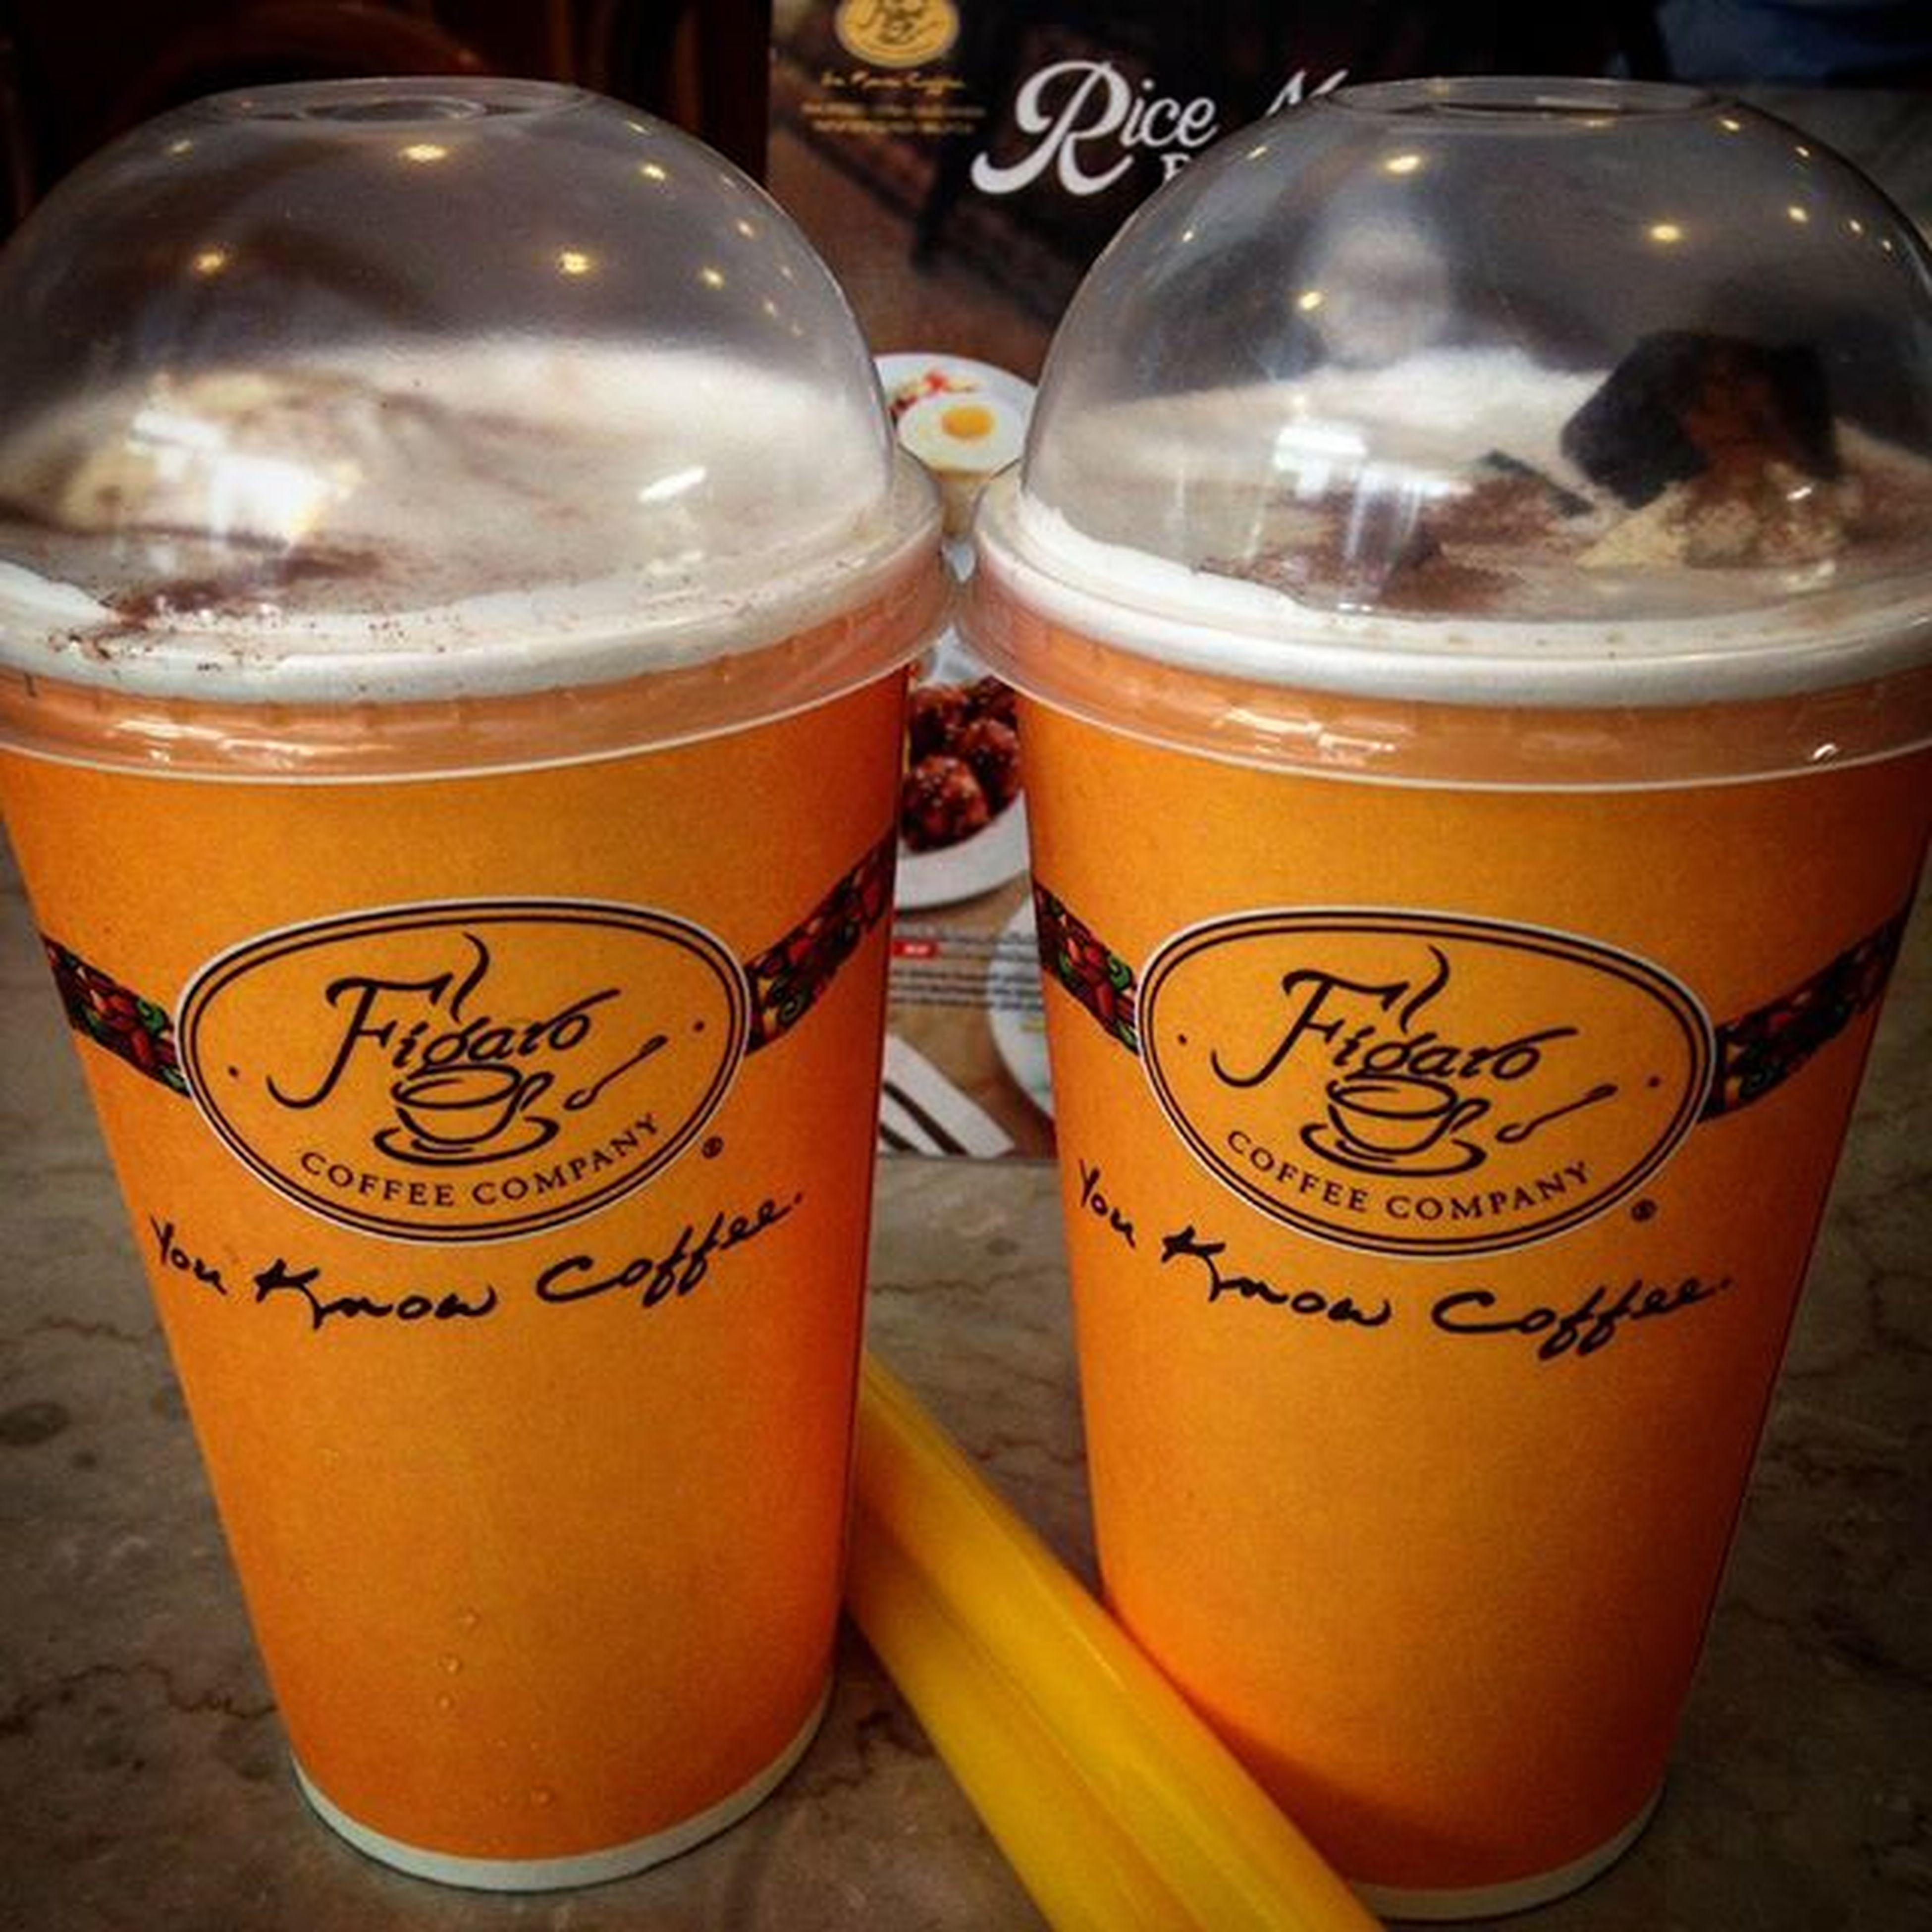 11/02/2015 Figaro Blissfulholiday Hazelnutcinnamonjellyfloat @figarocoffee